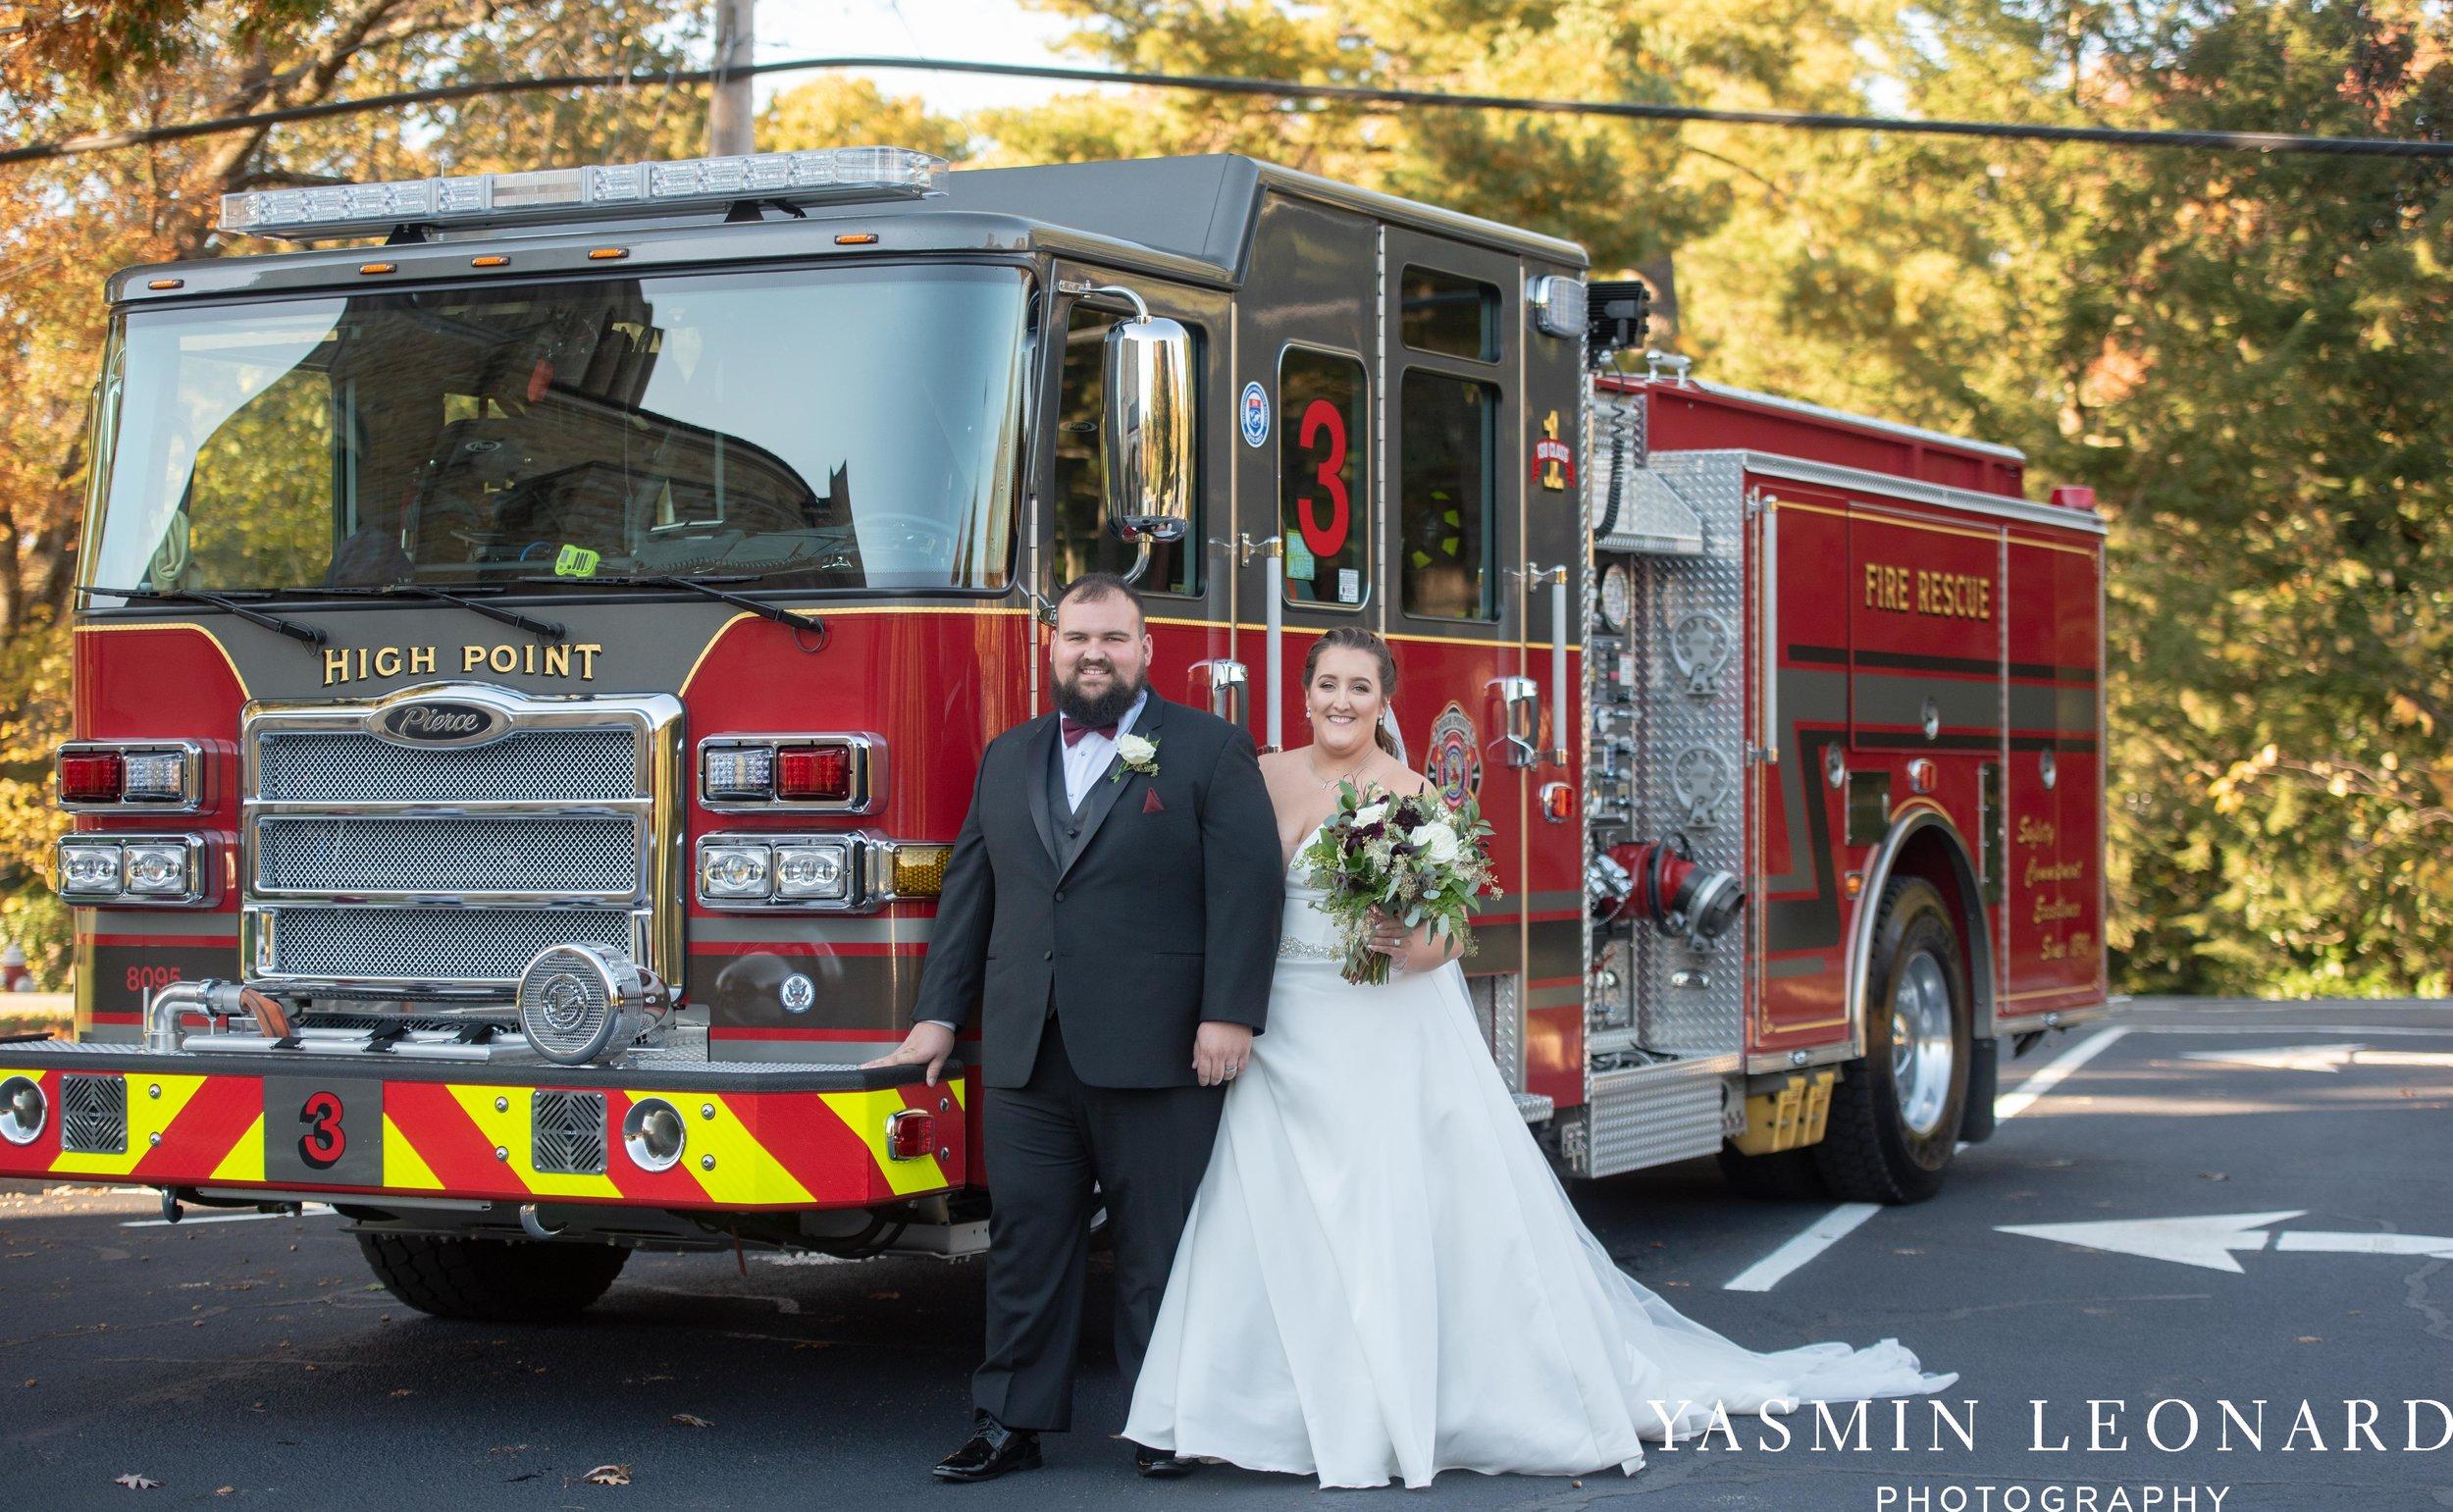 Wesley Memorial United Methodist Church - Old Homeplace Winery - High Point Weddings - High Point Wedding Photographer - NC Weddings - NC Barn Venue - Yasmin Leonard Photography-33.jpg